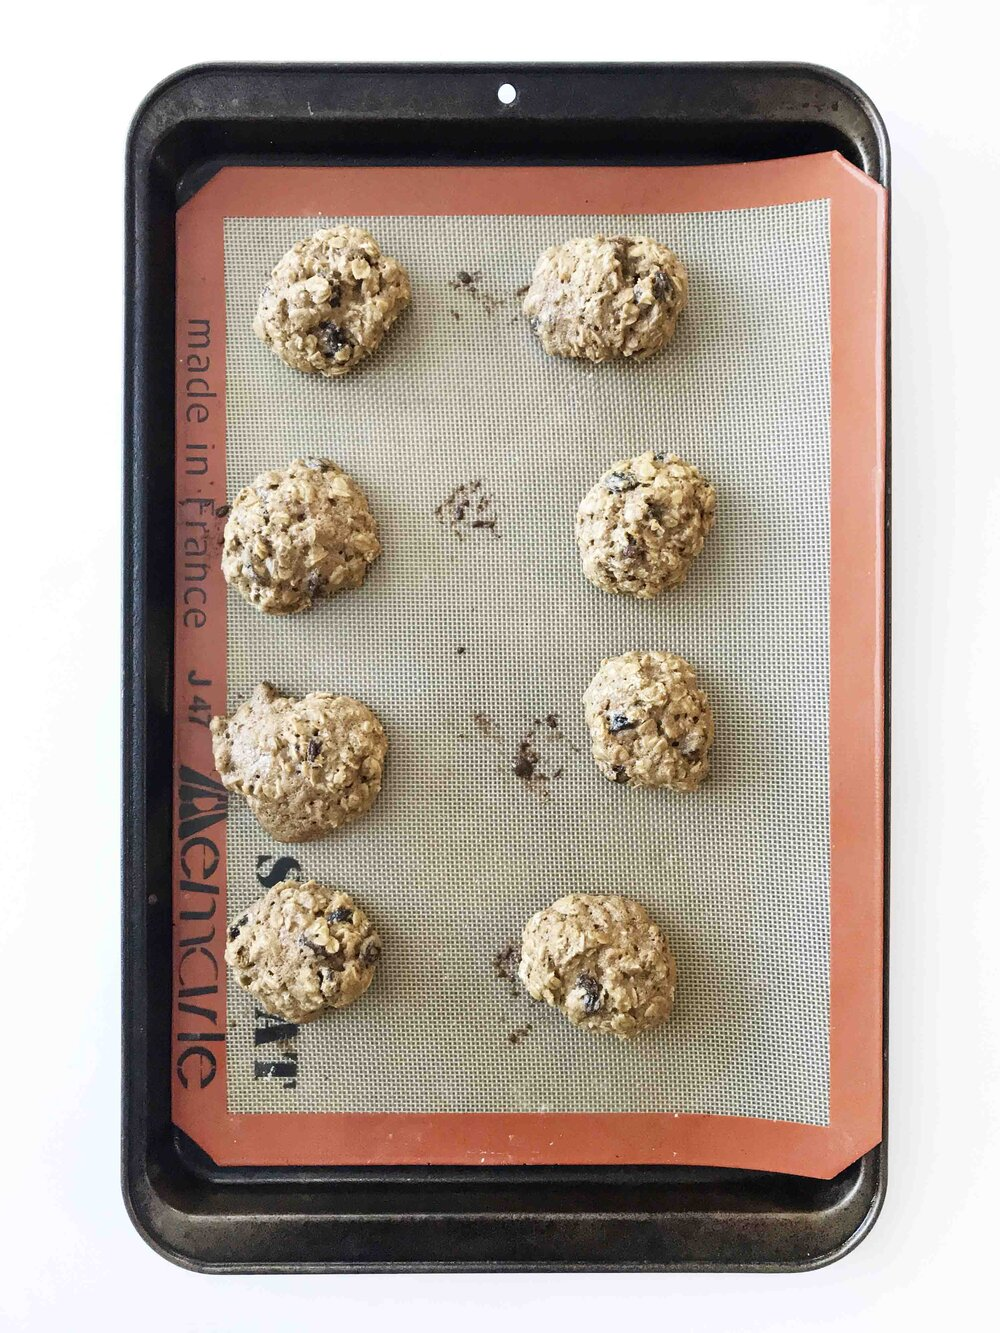 oatmeal-raisin-cookies9.jpg